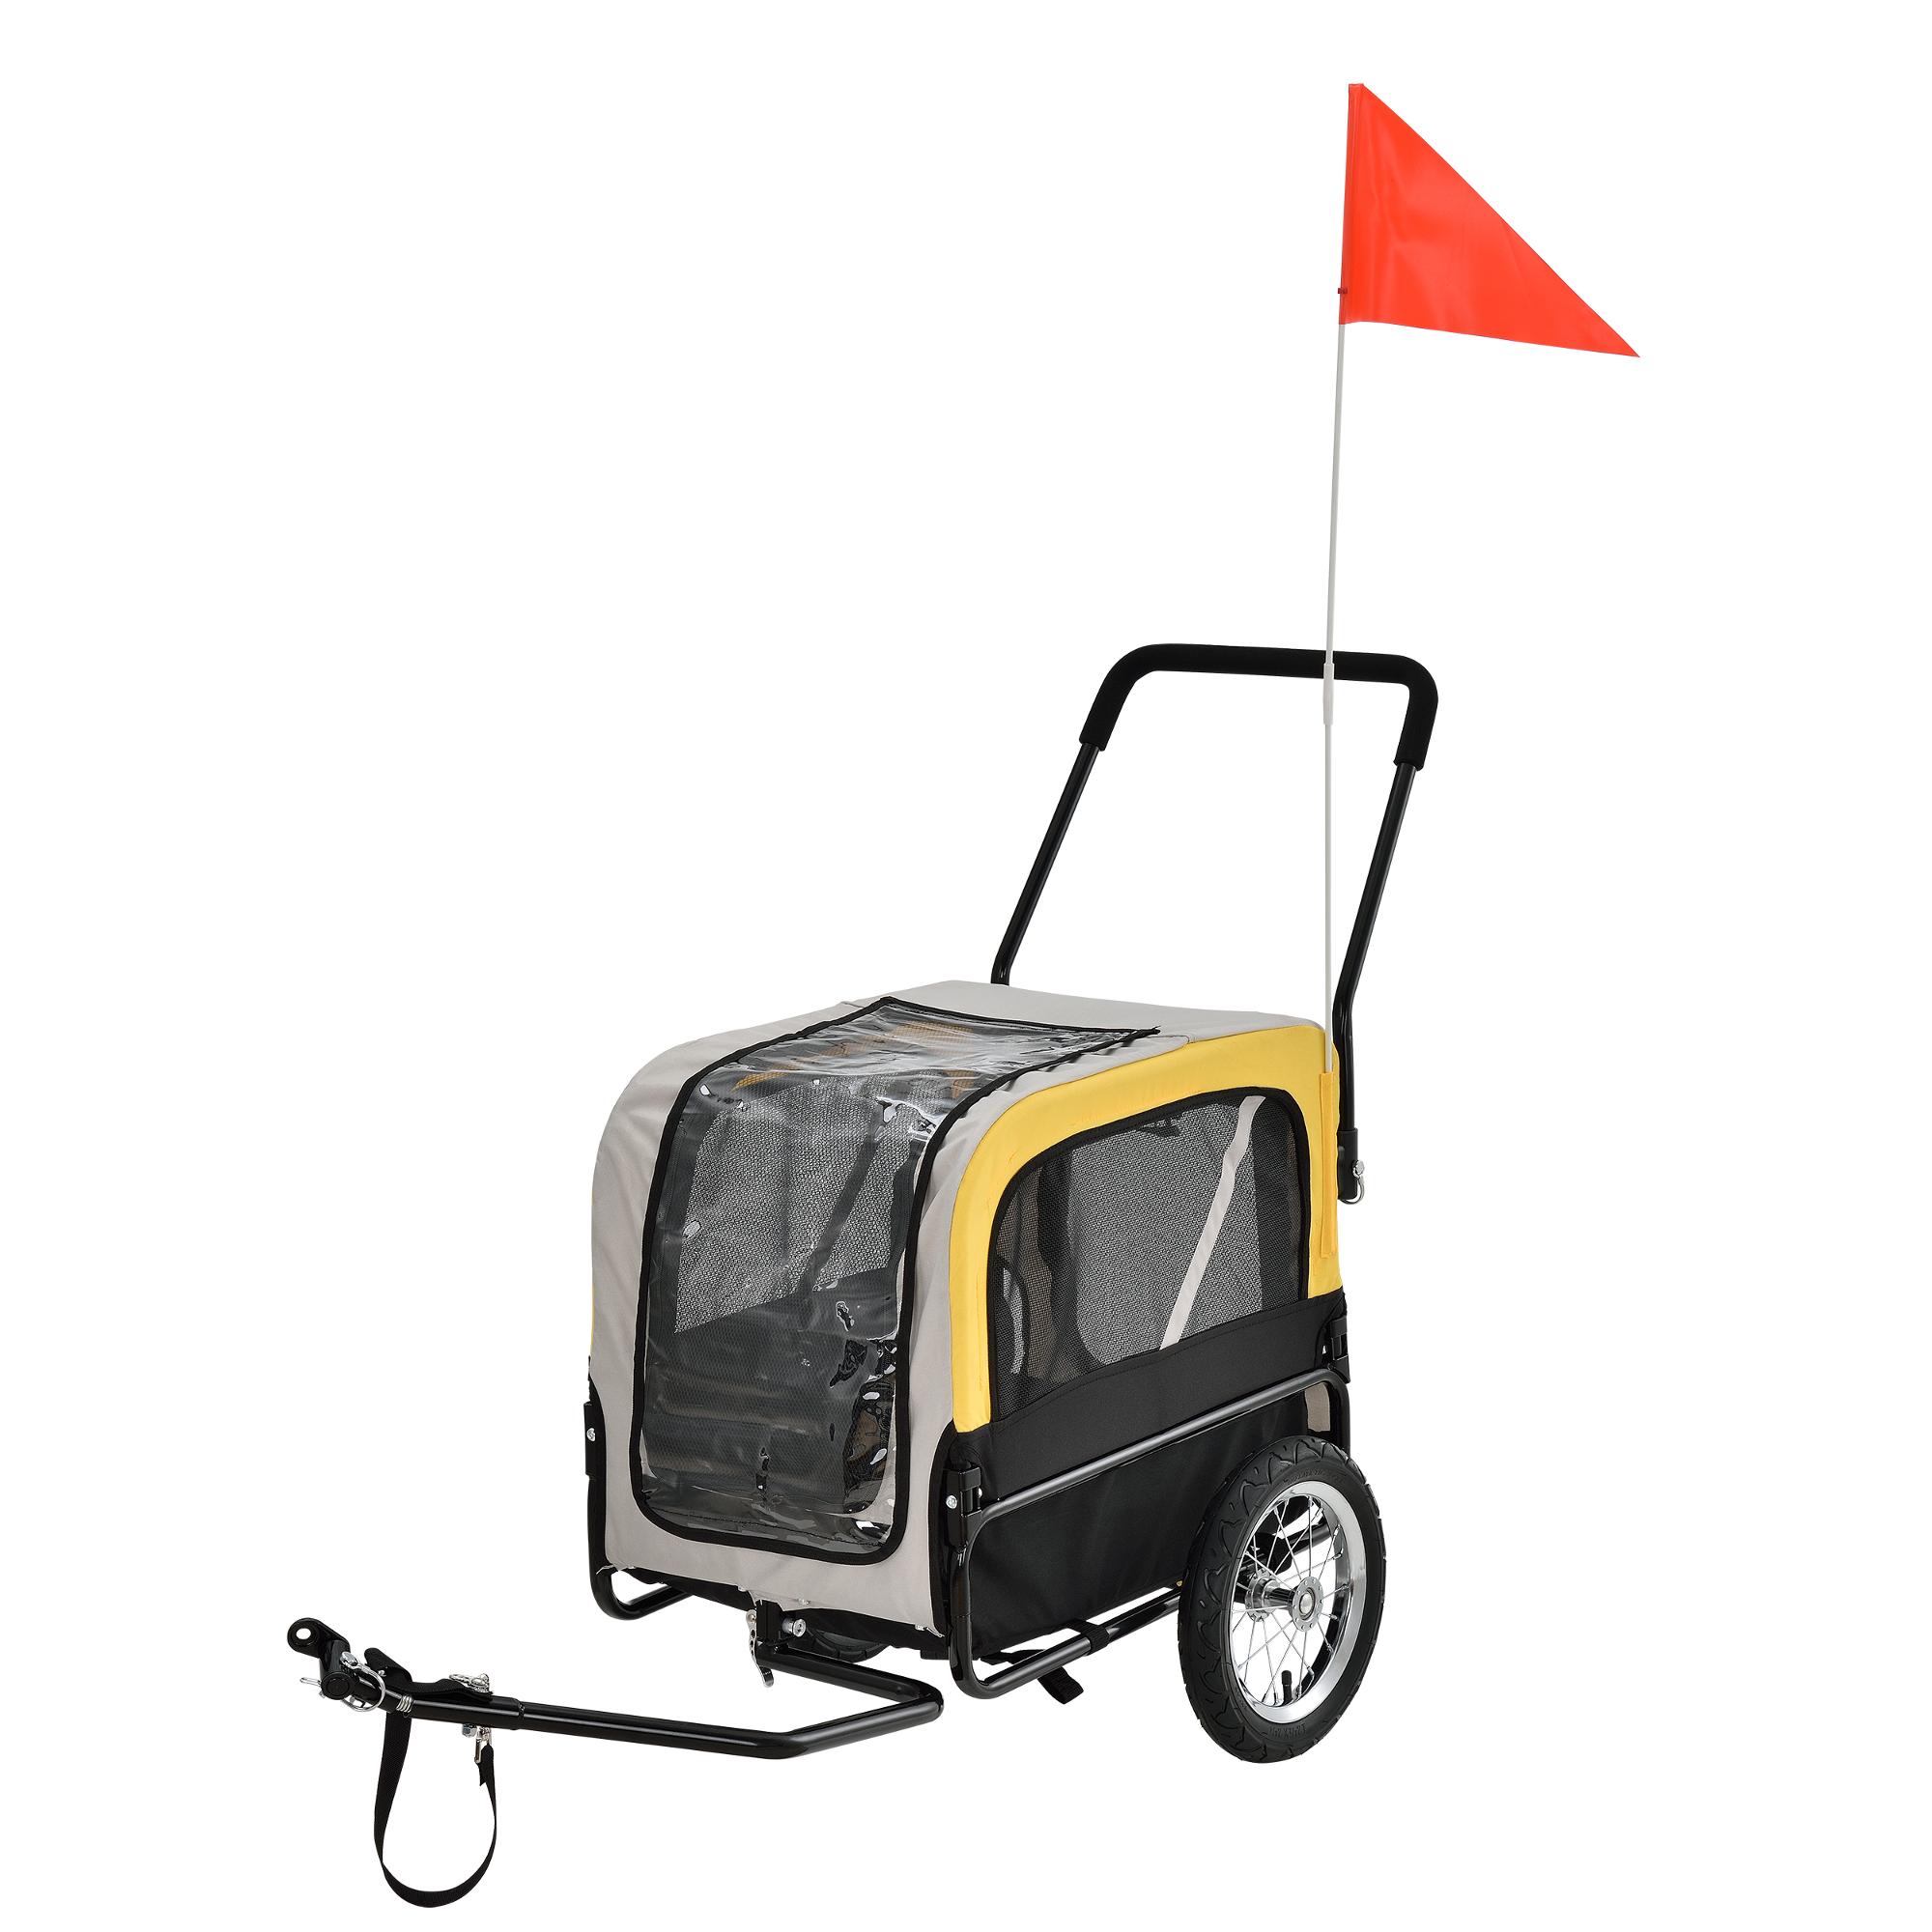 [pro.tec]® Vozík za kolo - do 25 kg - 107 x 56 x 97 cm